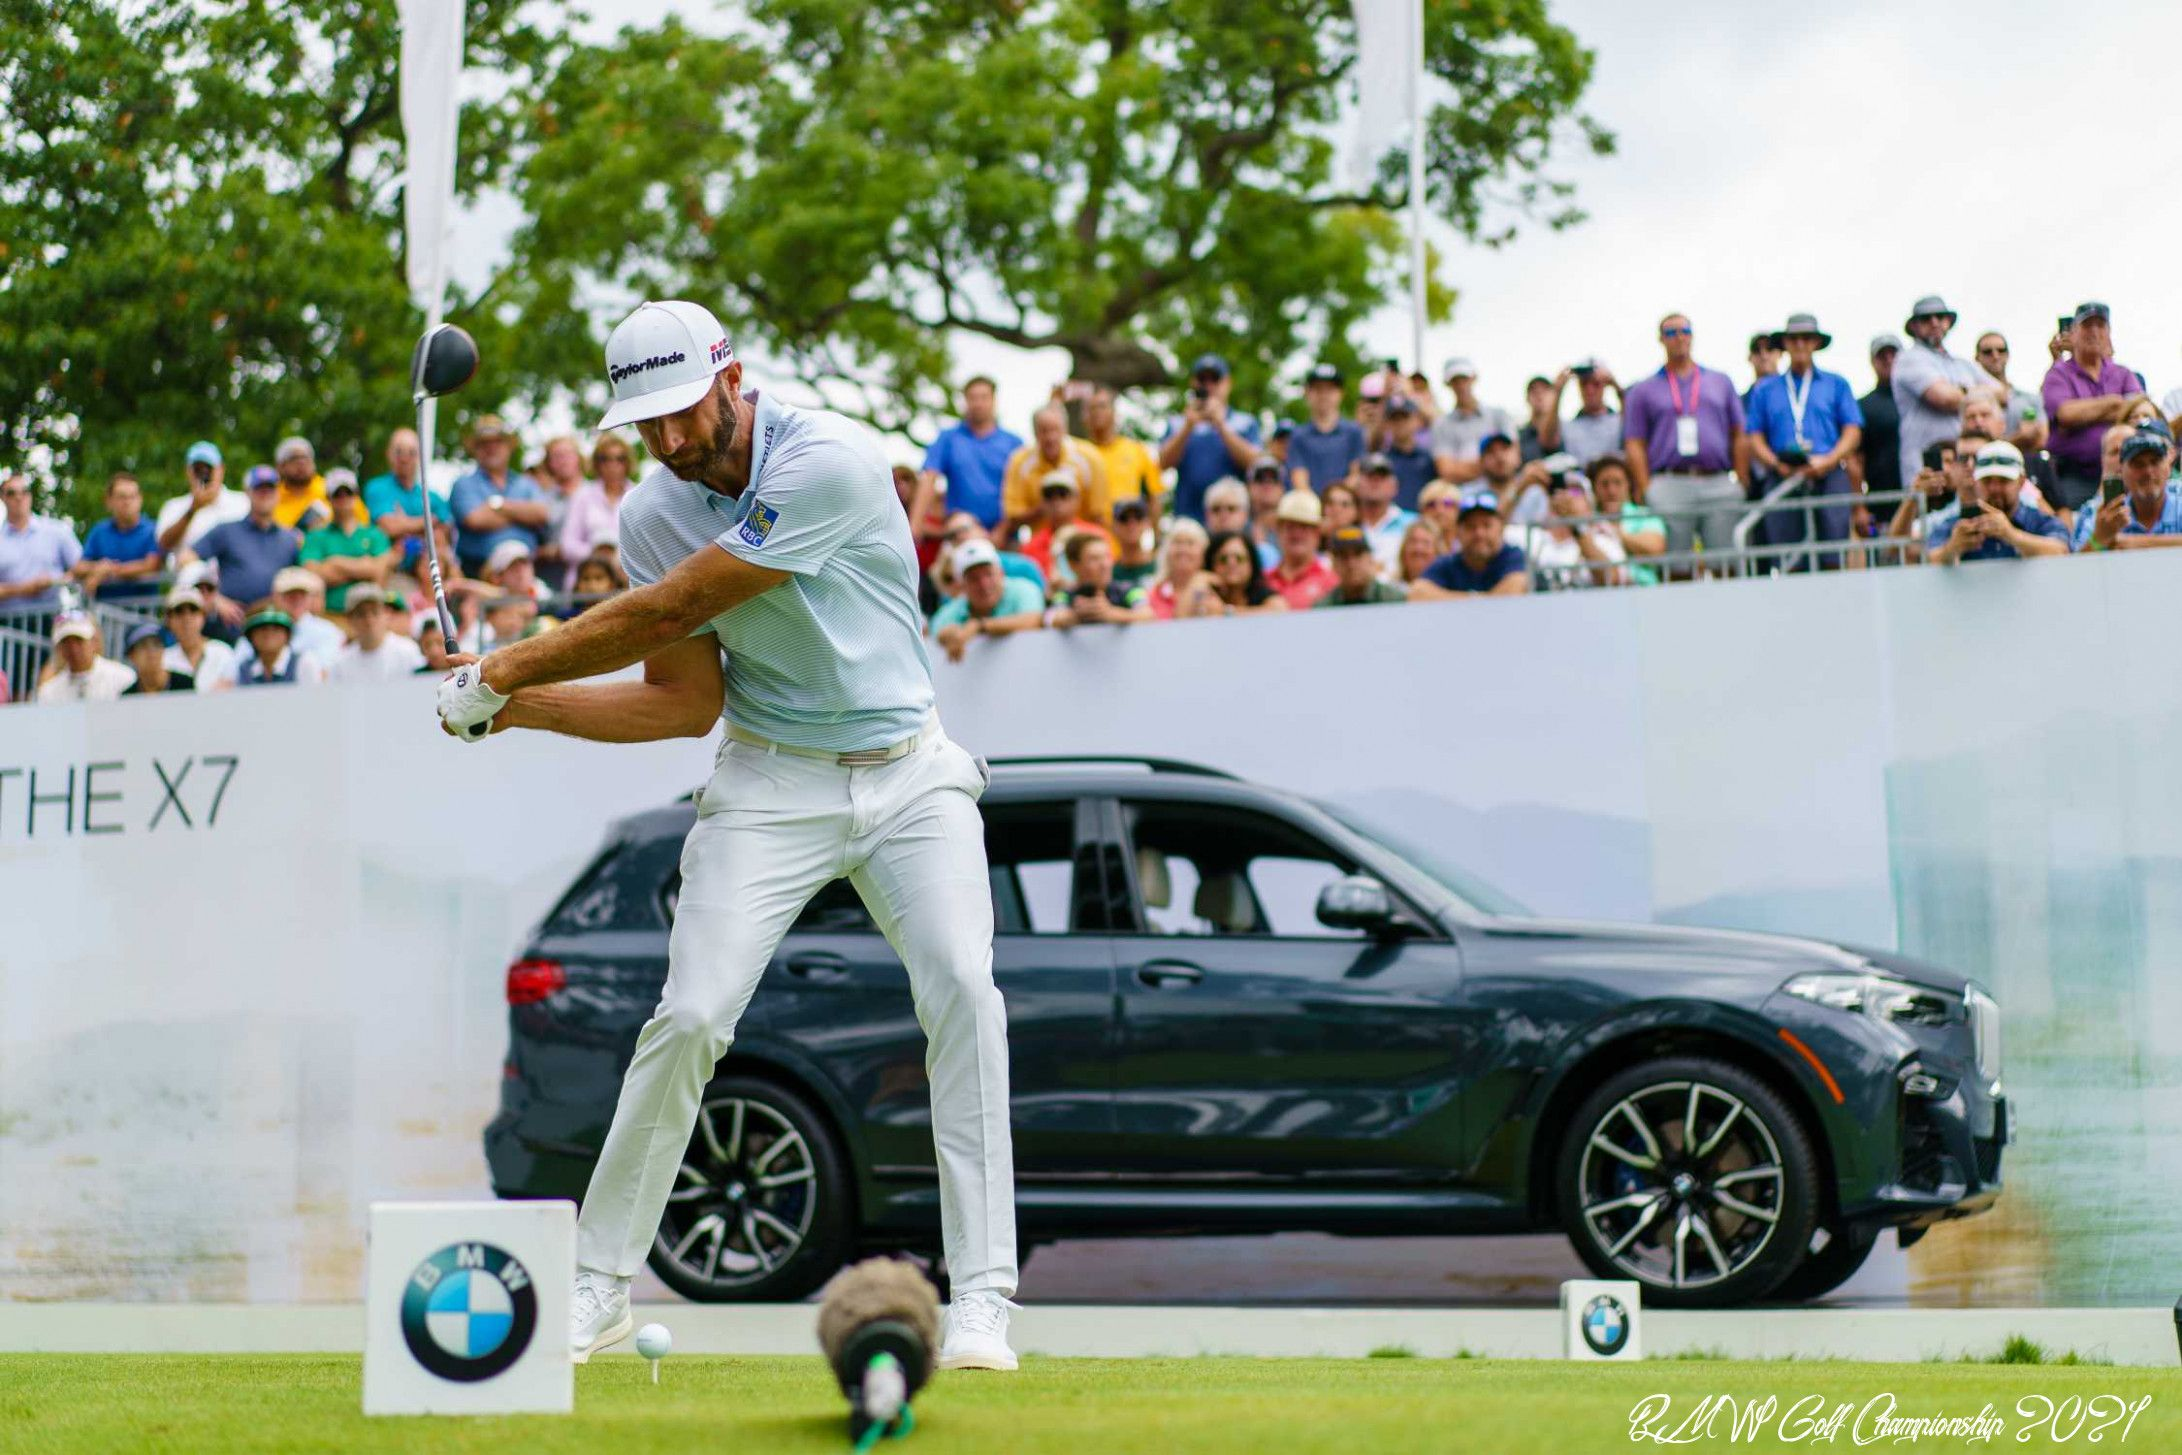 Bmw Golf Championship 2021 Concept In 2020 Pga Tour Bmw Golf Golf Tournament